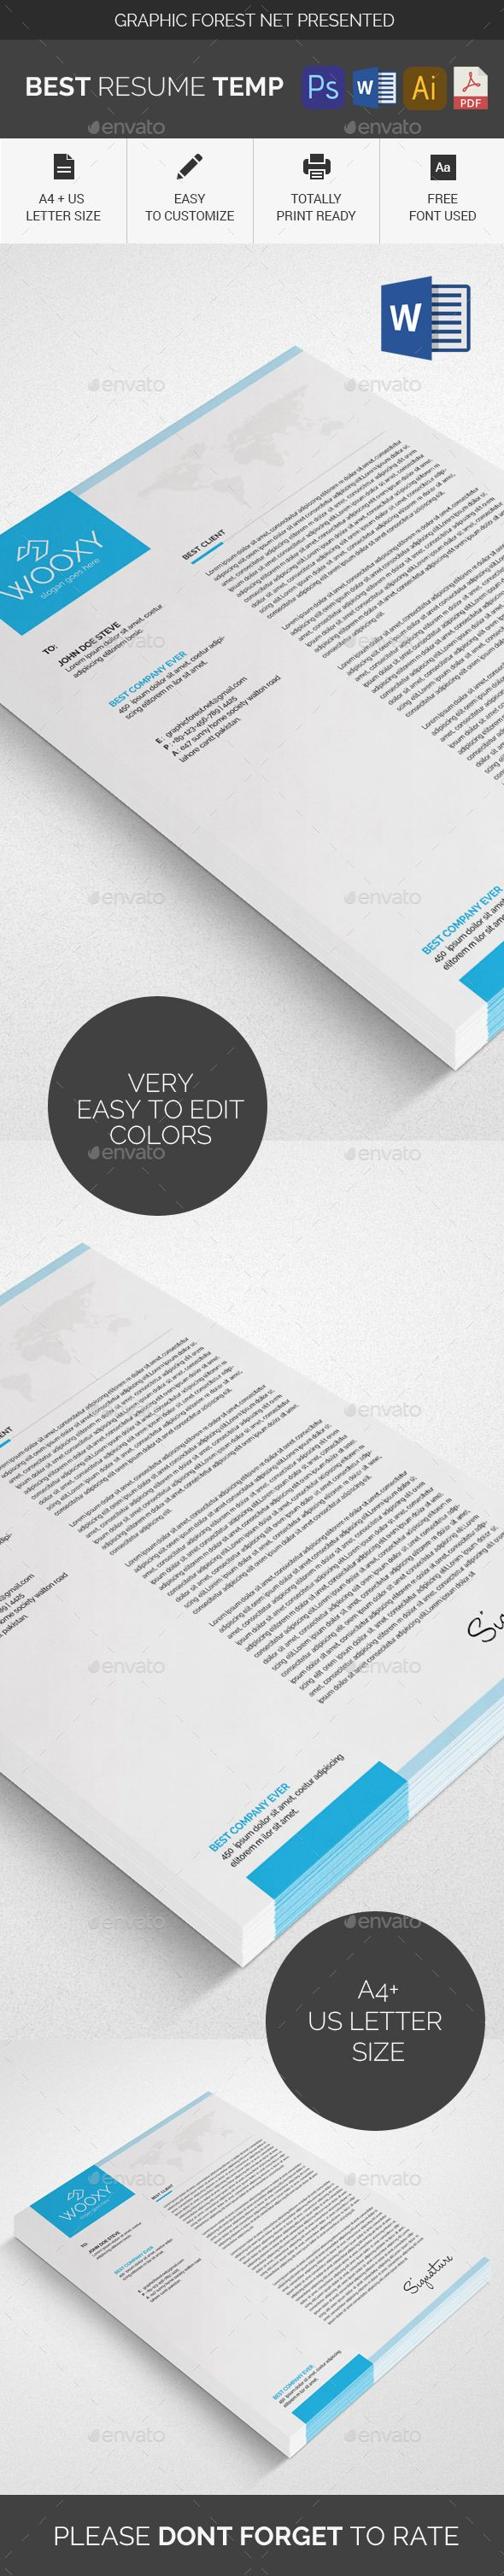 printable resume format%0A Letterhead